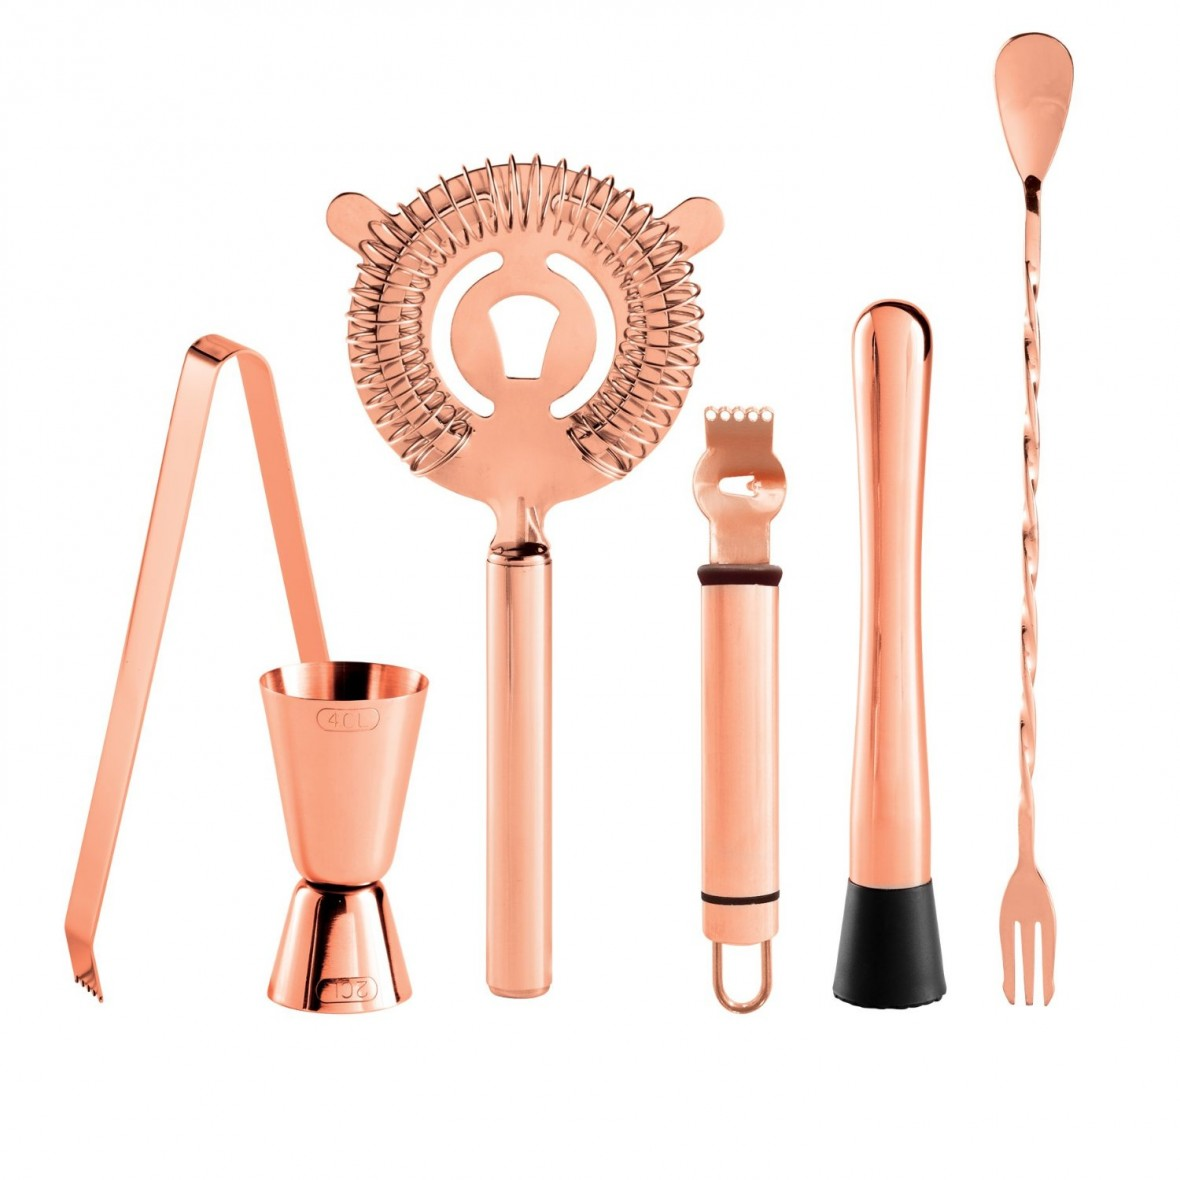 Hostess Gift Idea - Rose Gold Bar Tools